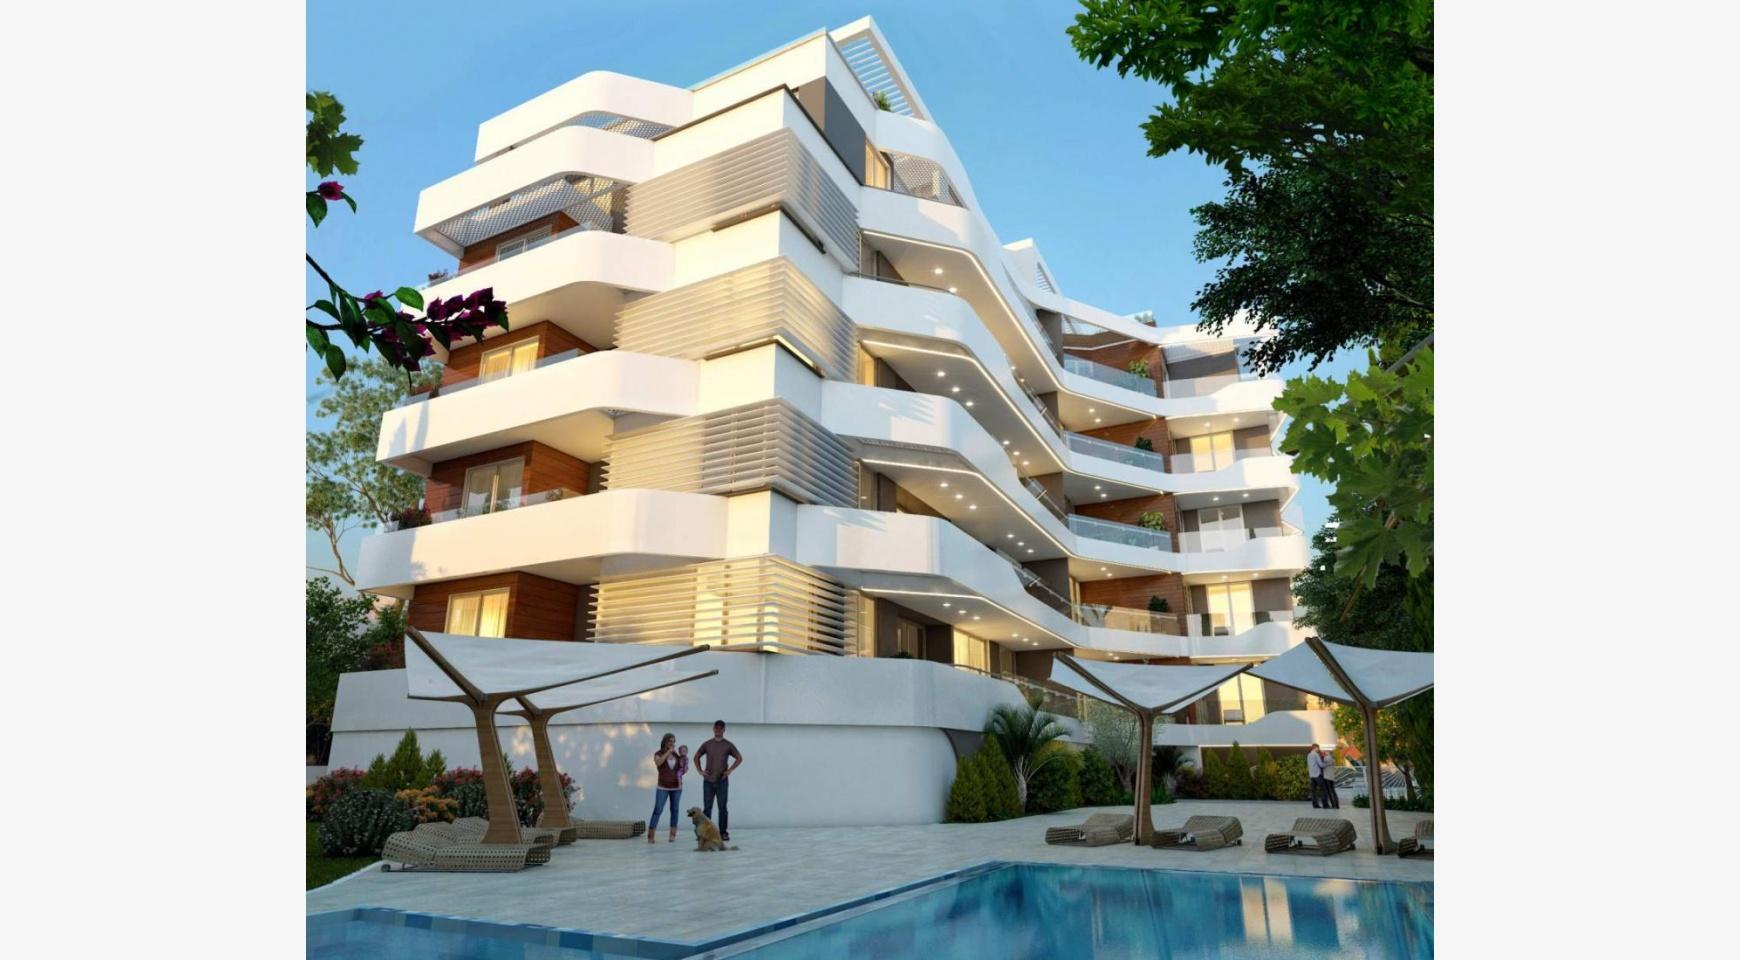 New 2 Bedroom Apartment in a Contemporary Complex near the Sea - 3